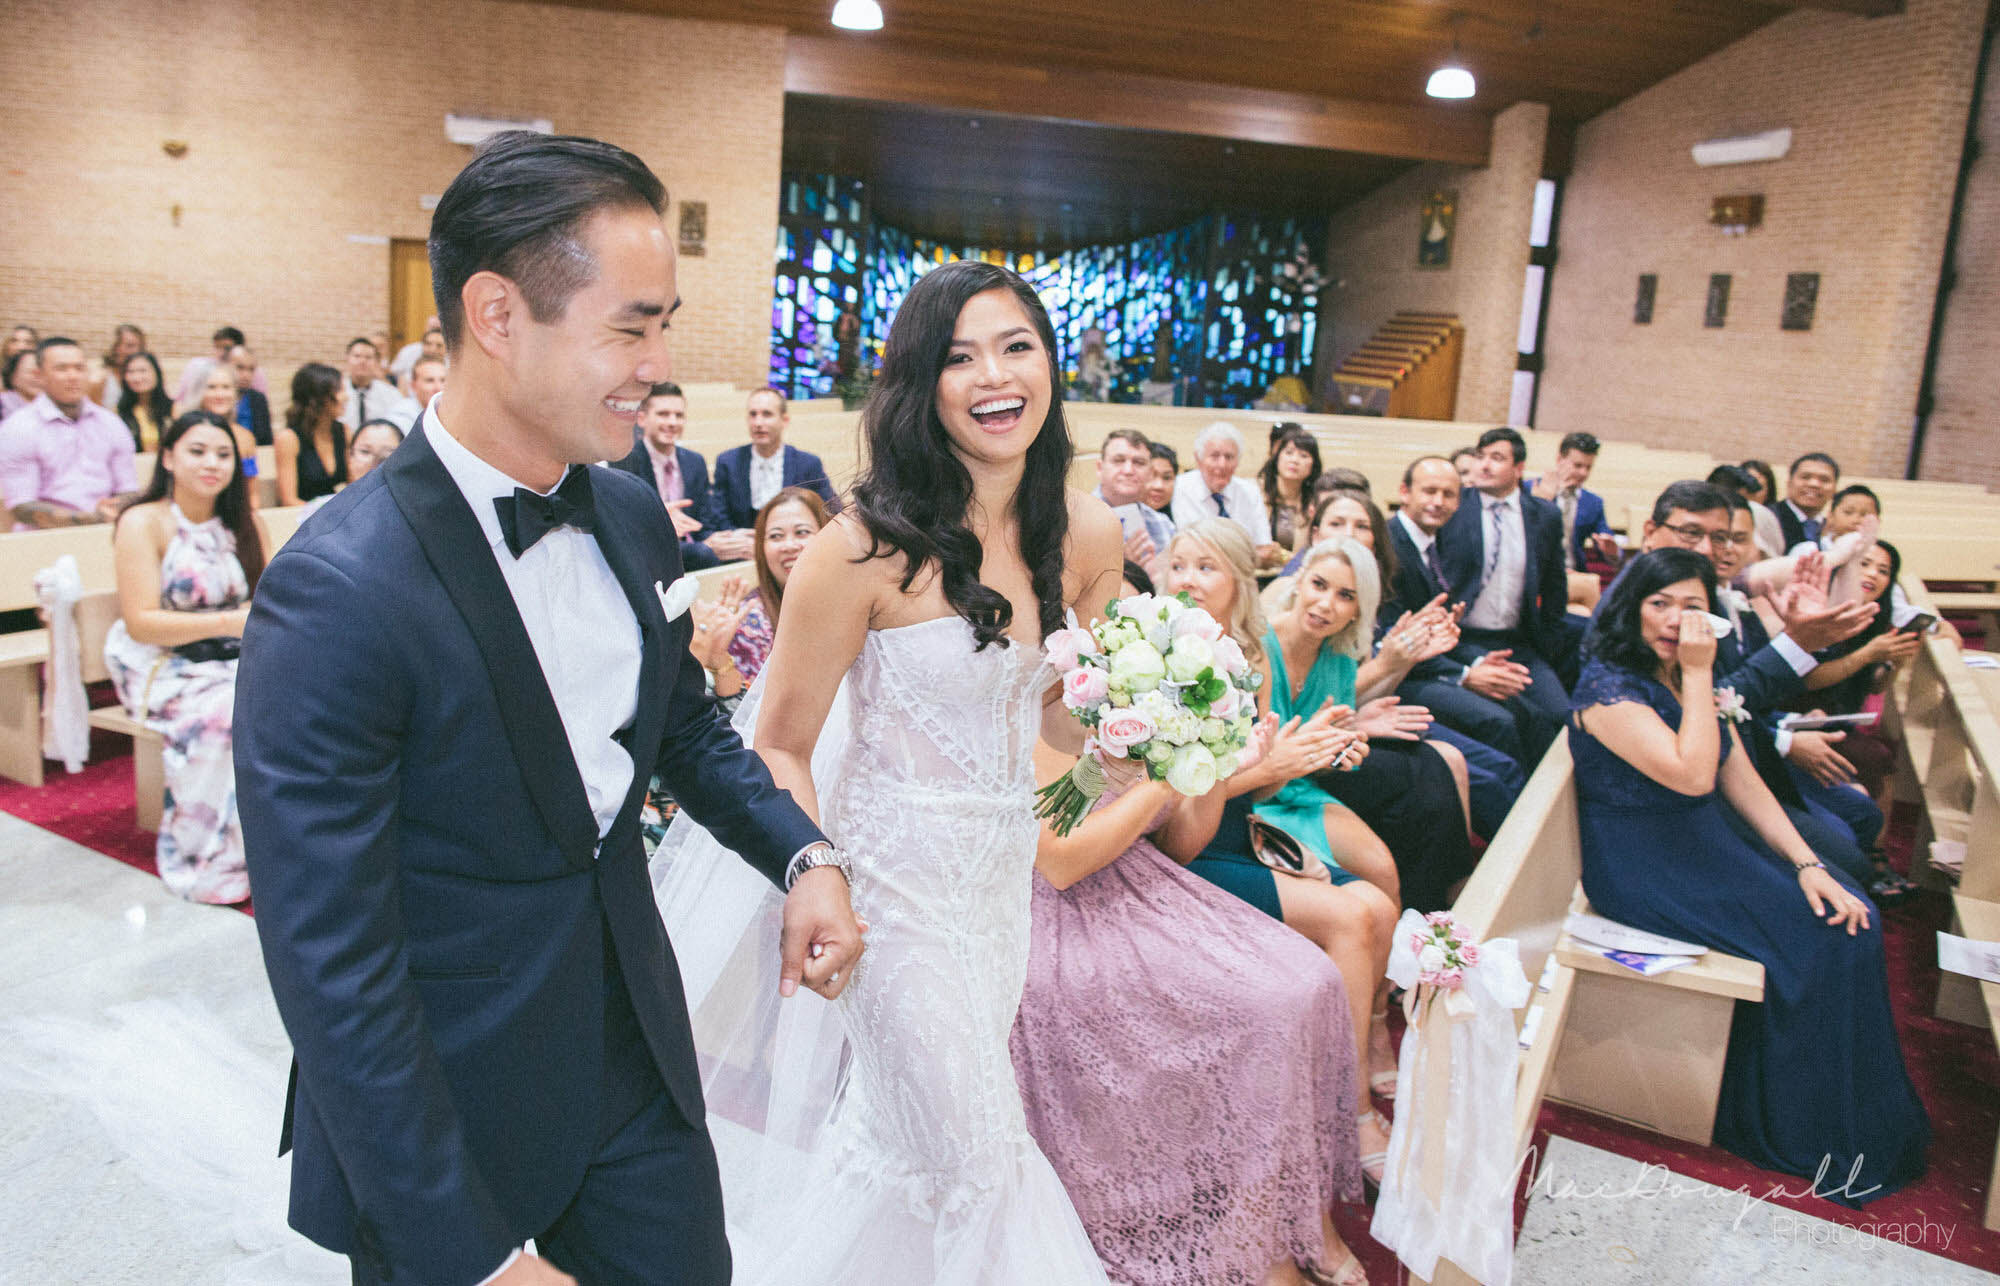 MacDougall-Photography-Sydney-Wedding-Photographers-32.jpg